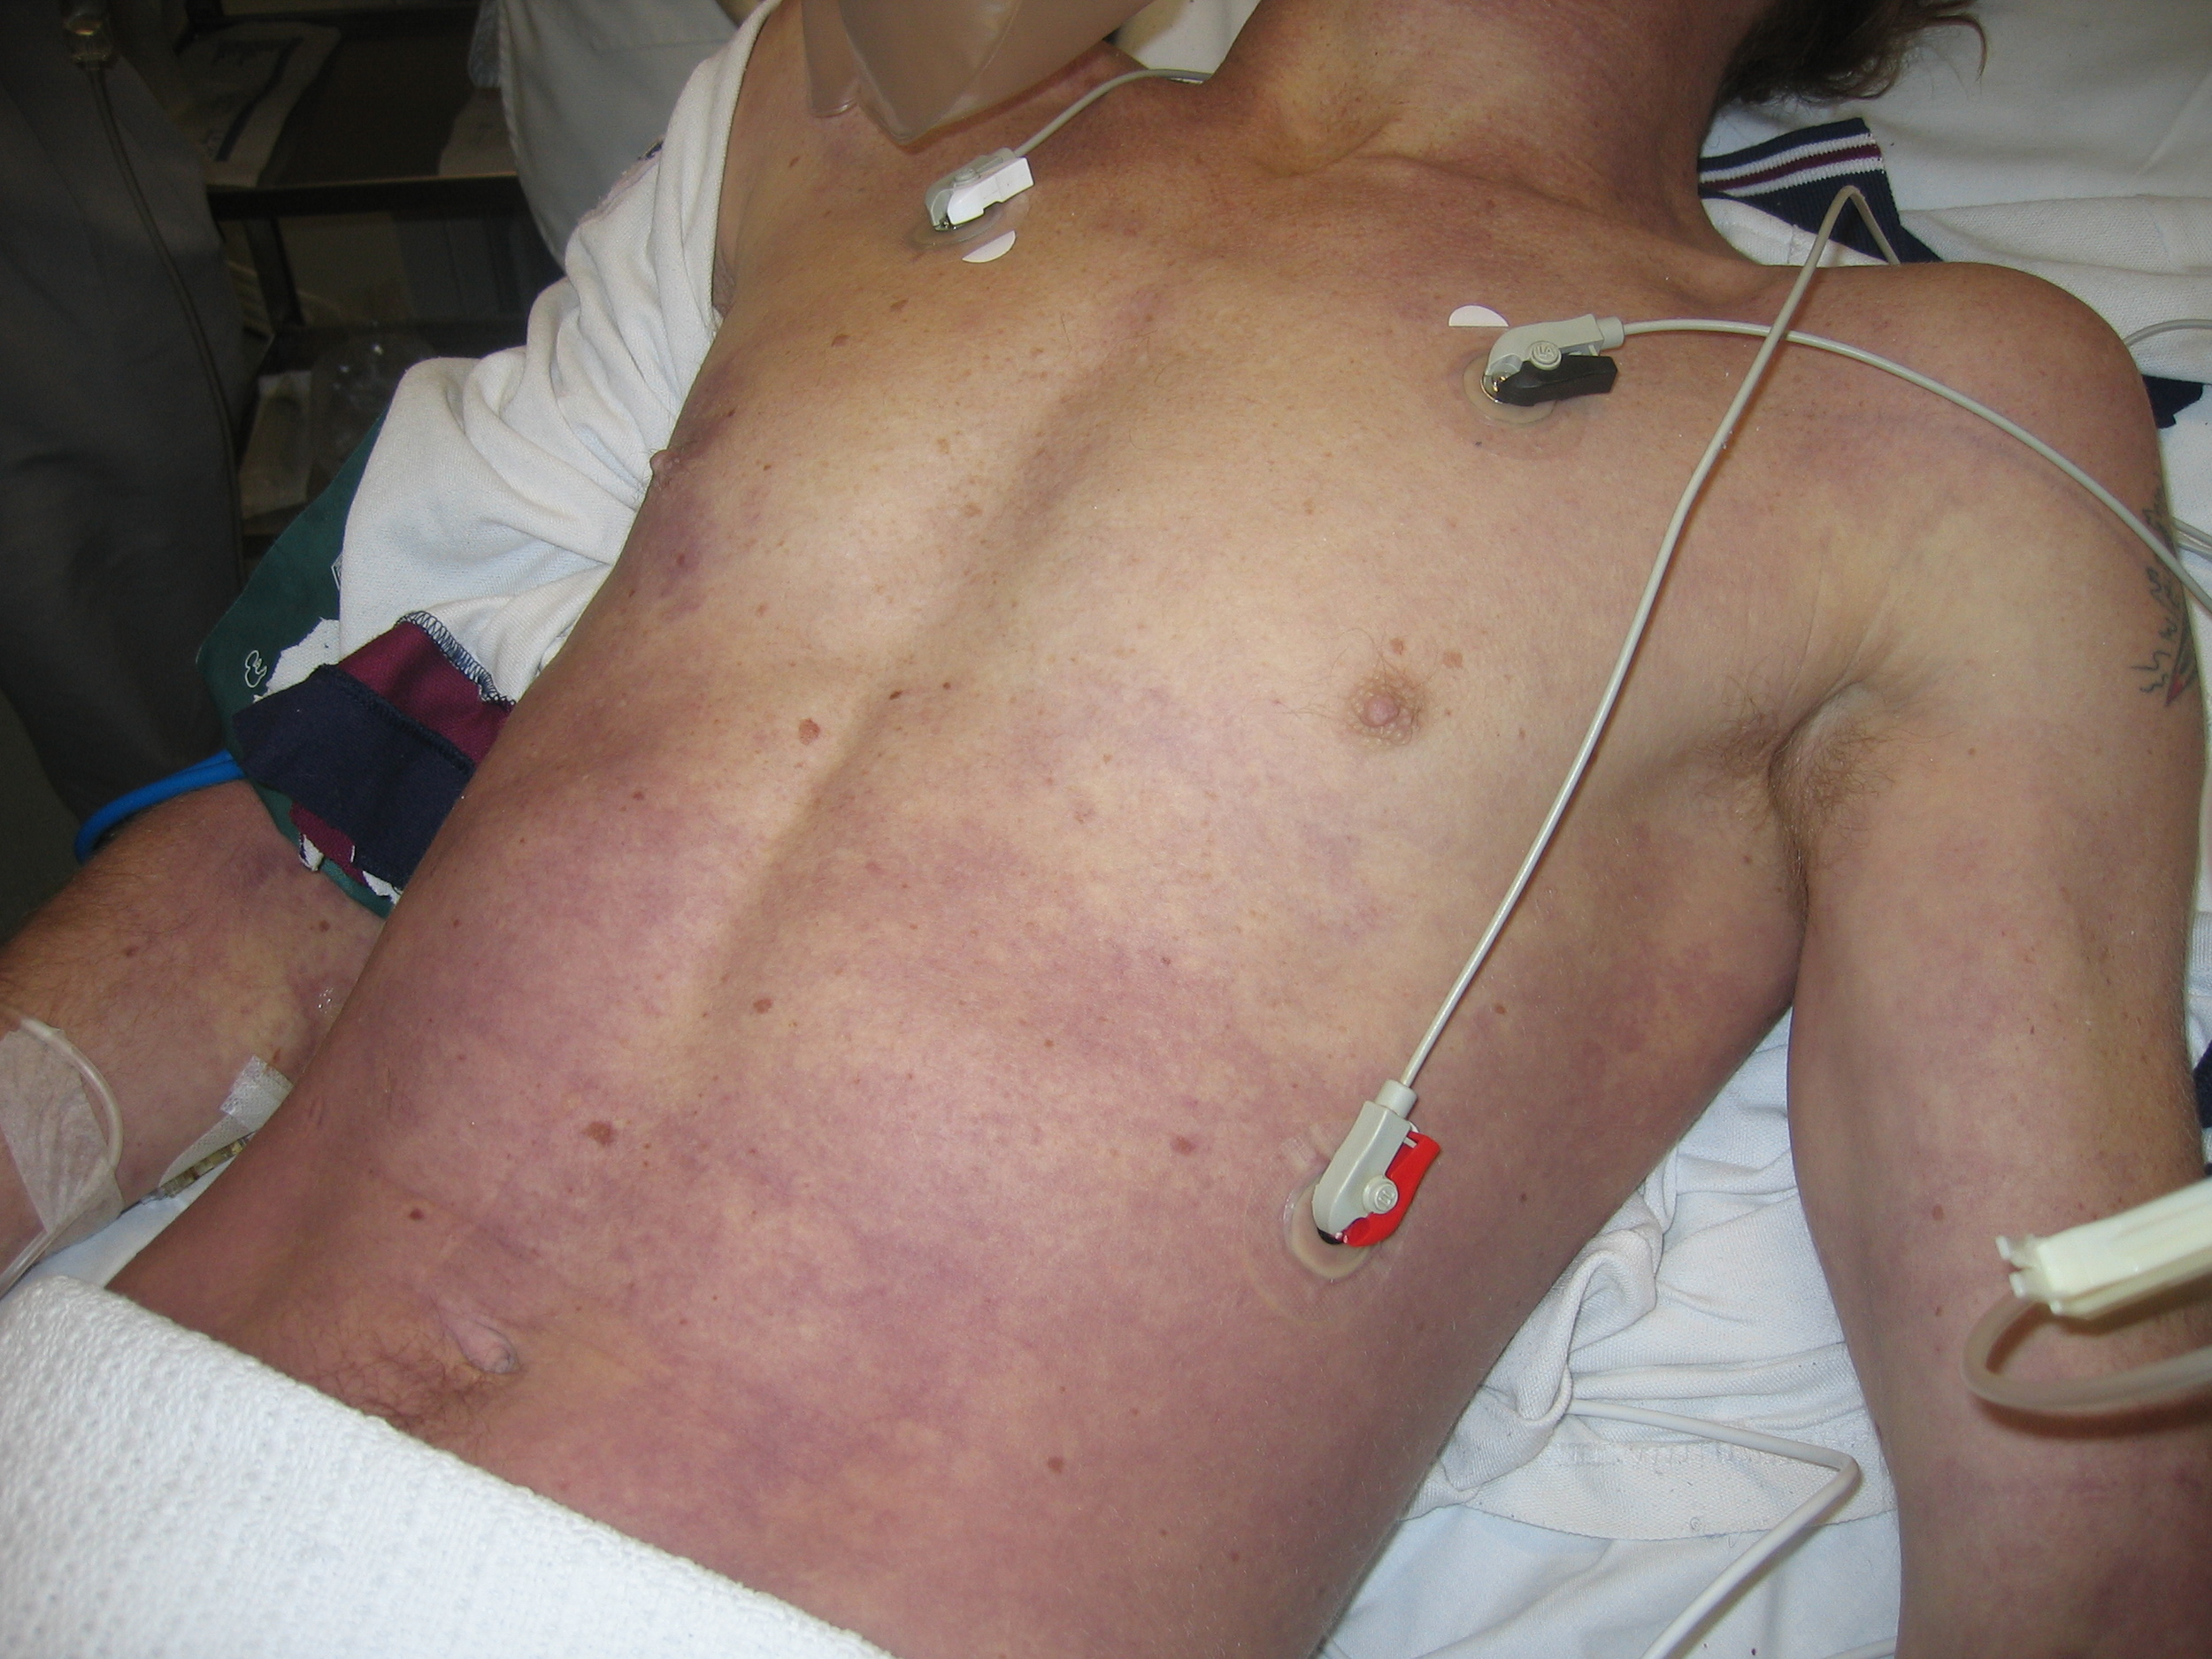 Anaphylaxis Skin Rash 2